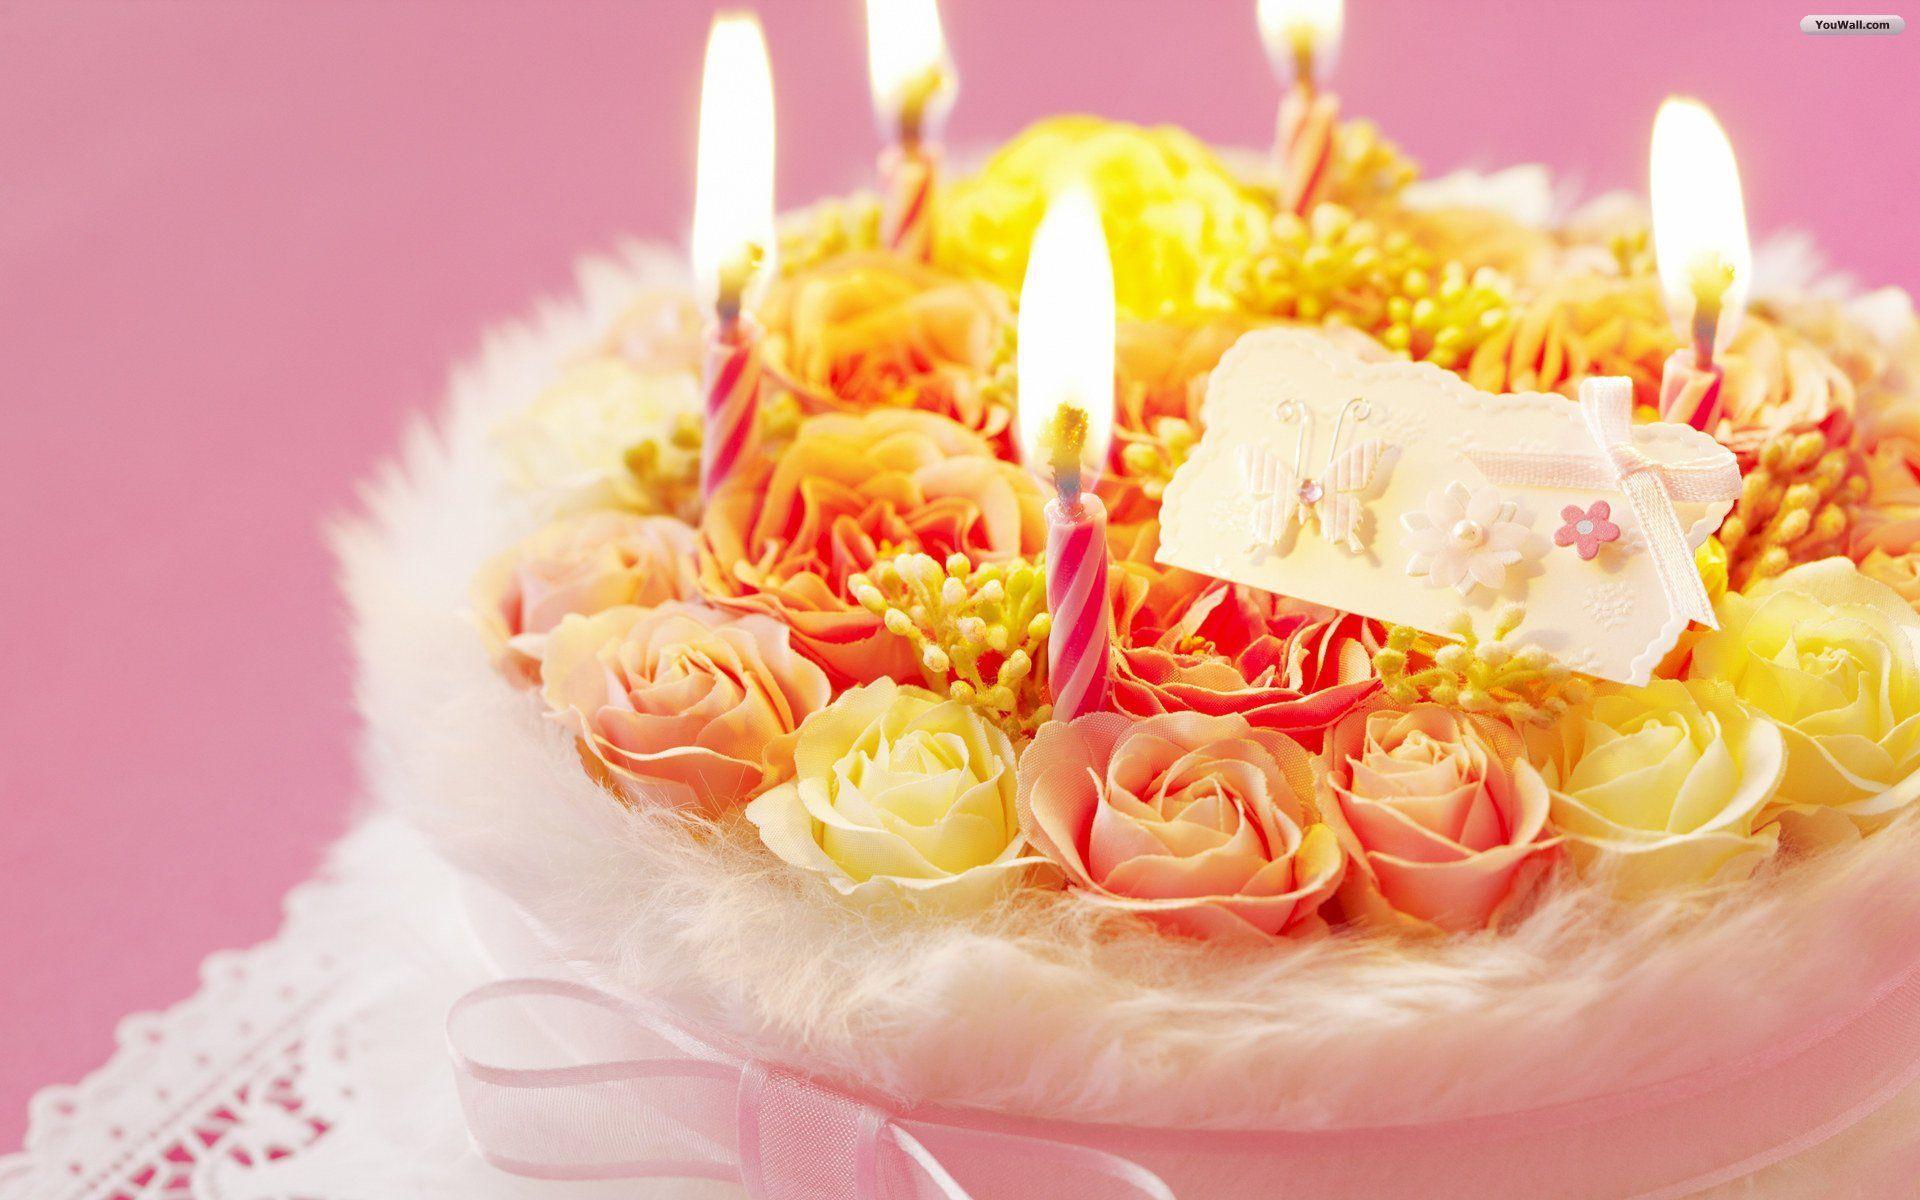 Happy-birthday-with-cake-Happy-birthday-Pinterest-wallpaper-wp3406552